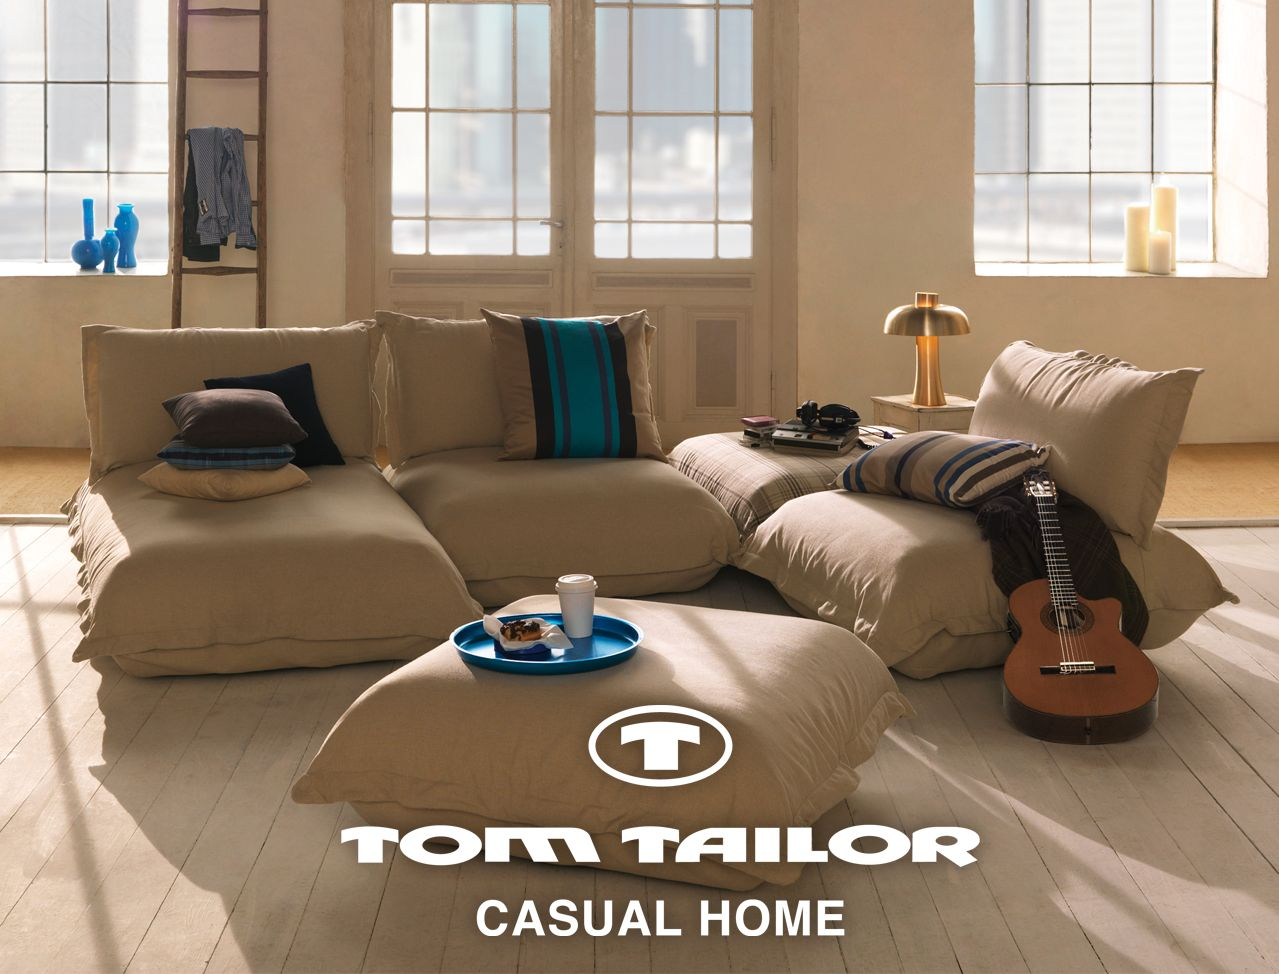 Cushion Sofa Element Group Tom Tailor Www Tom Tailor Com Kissen Sofa Haus Wohnen